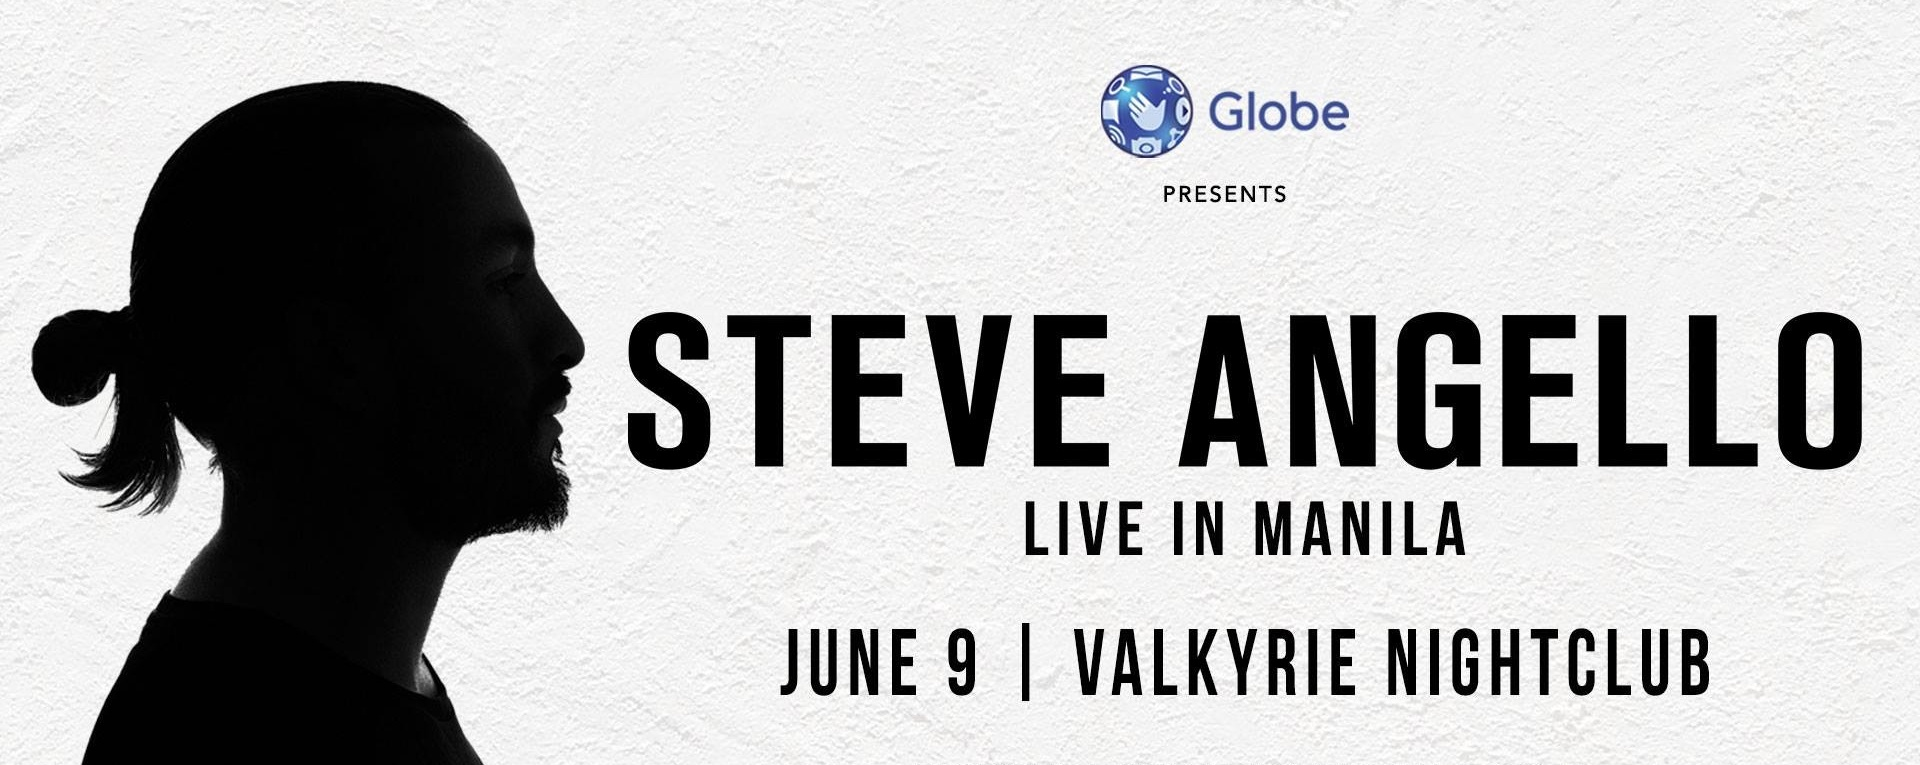 Steve Angello Live at Valkyrie Nightclub